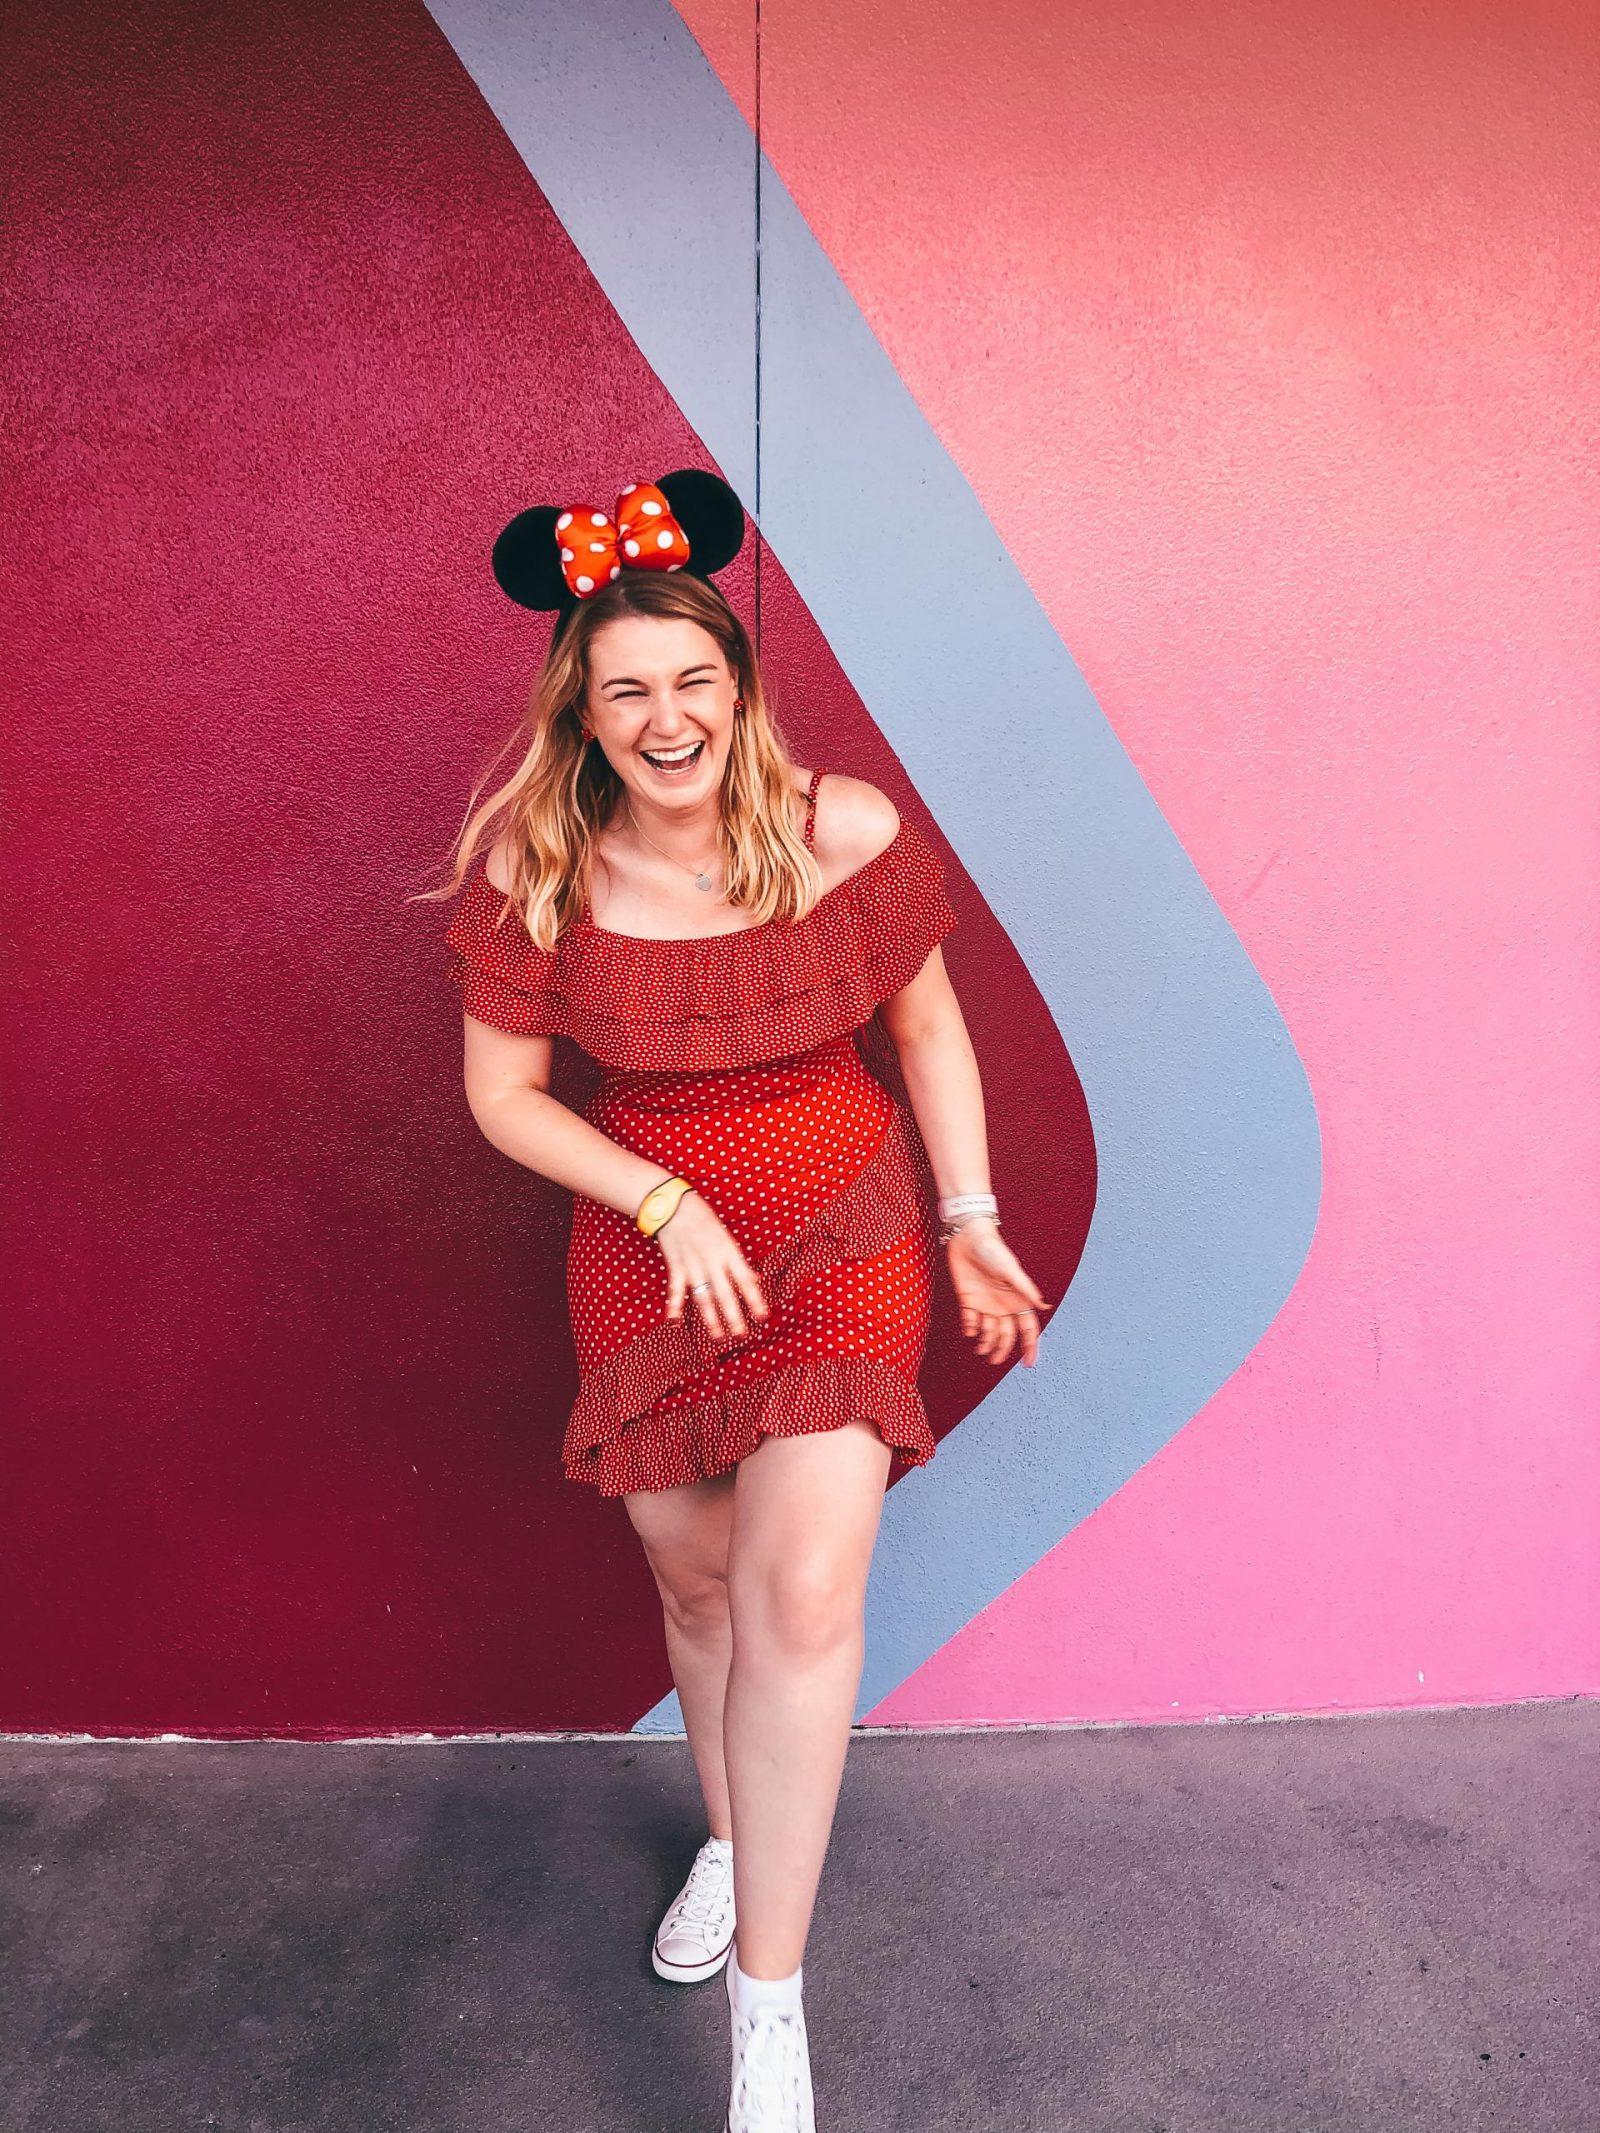 Bubblegum Wall - Disney World Instagram Walls